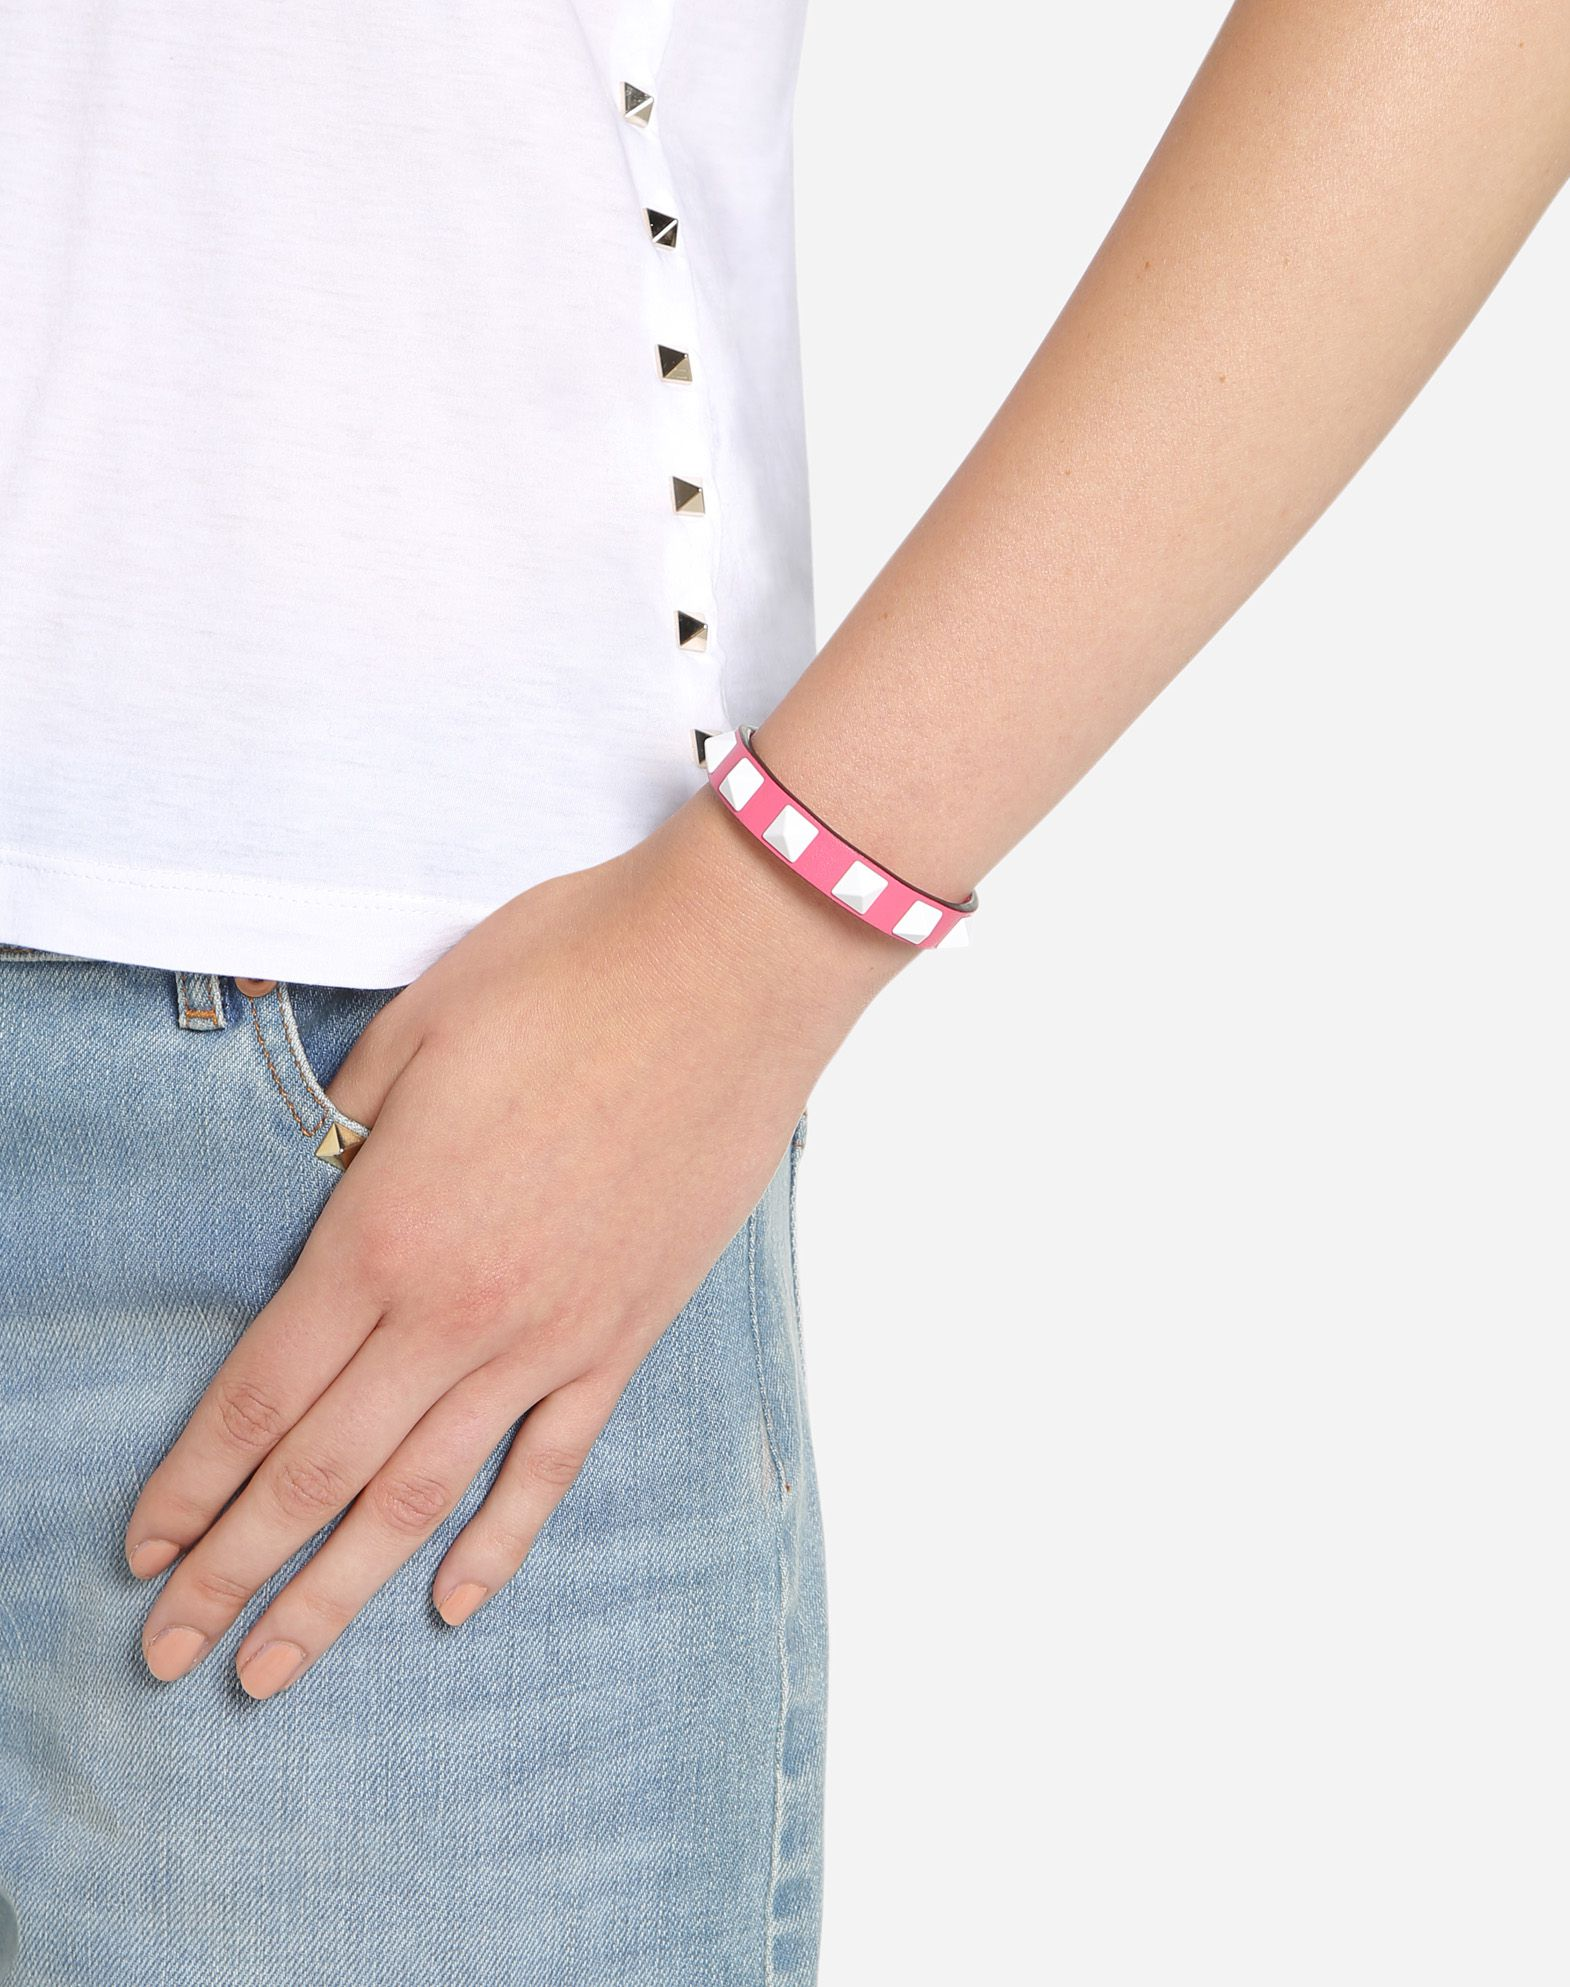 Valentino Garavani Rockstud turquoise bracelet Valentino 3jVzPZ9K